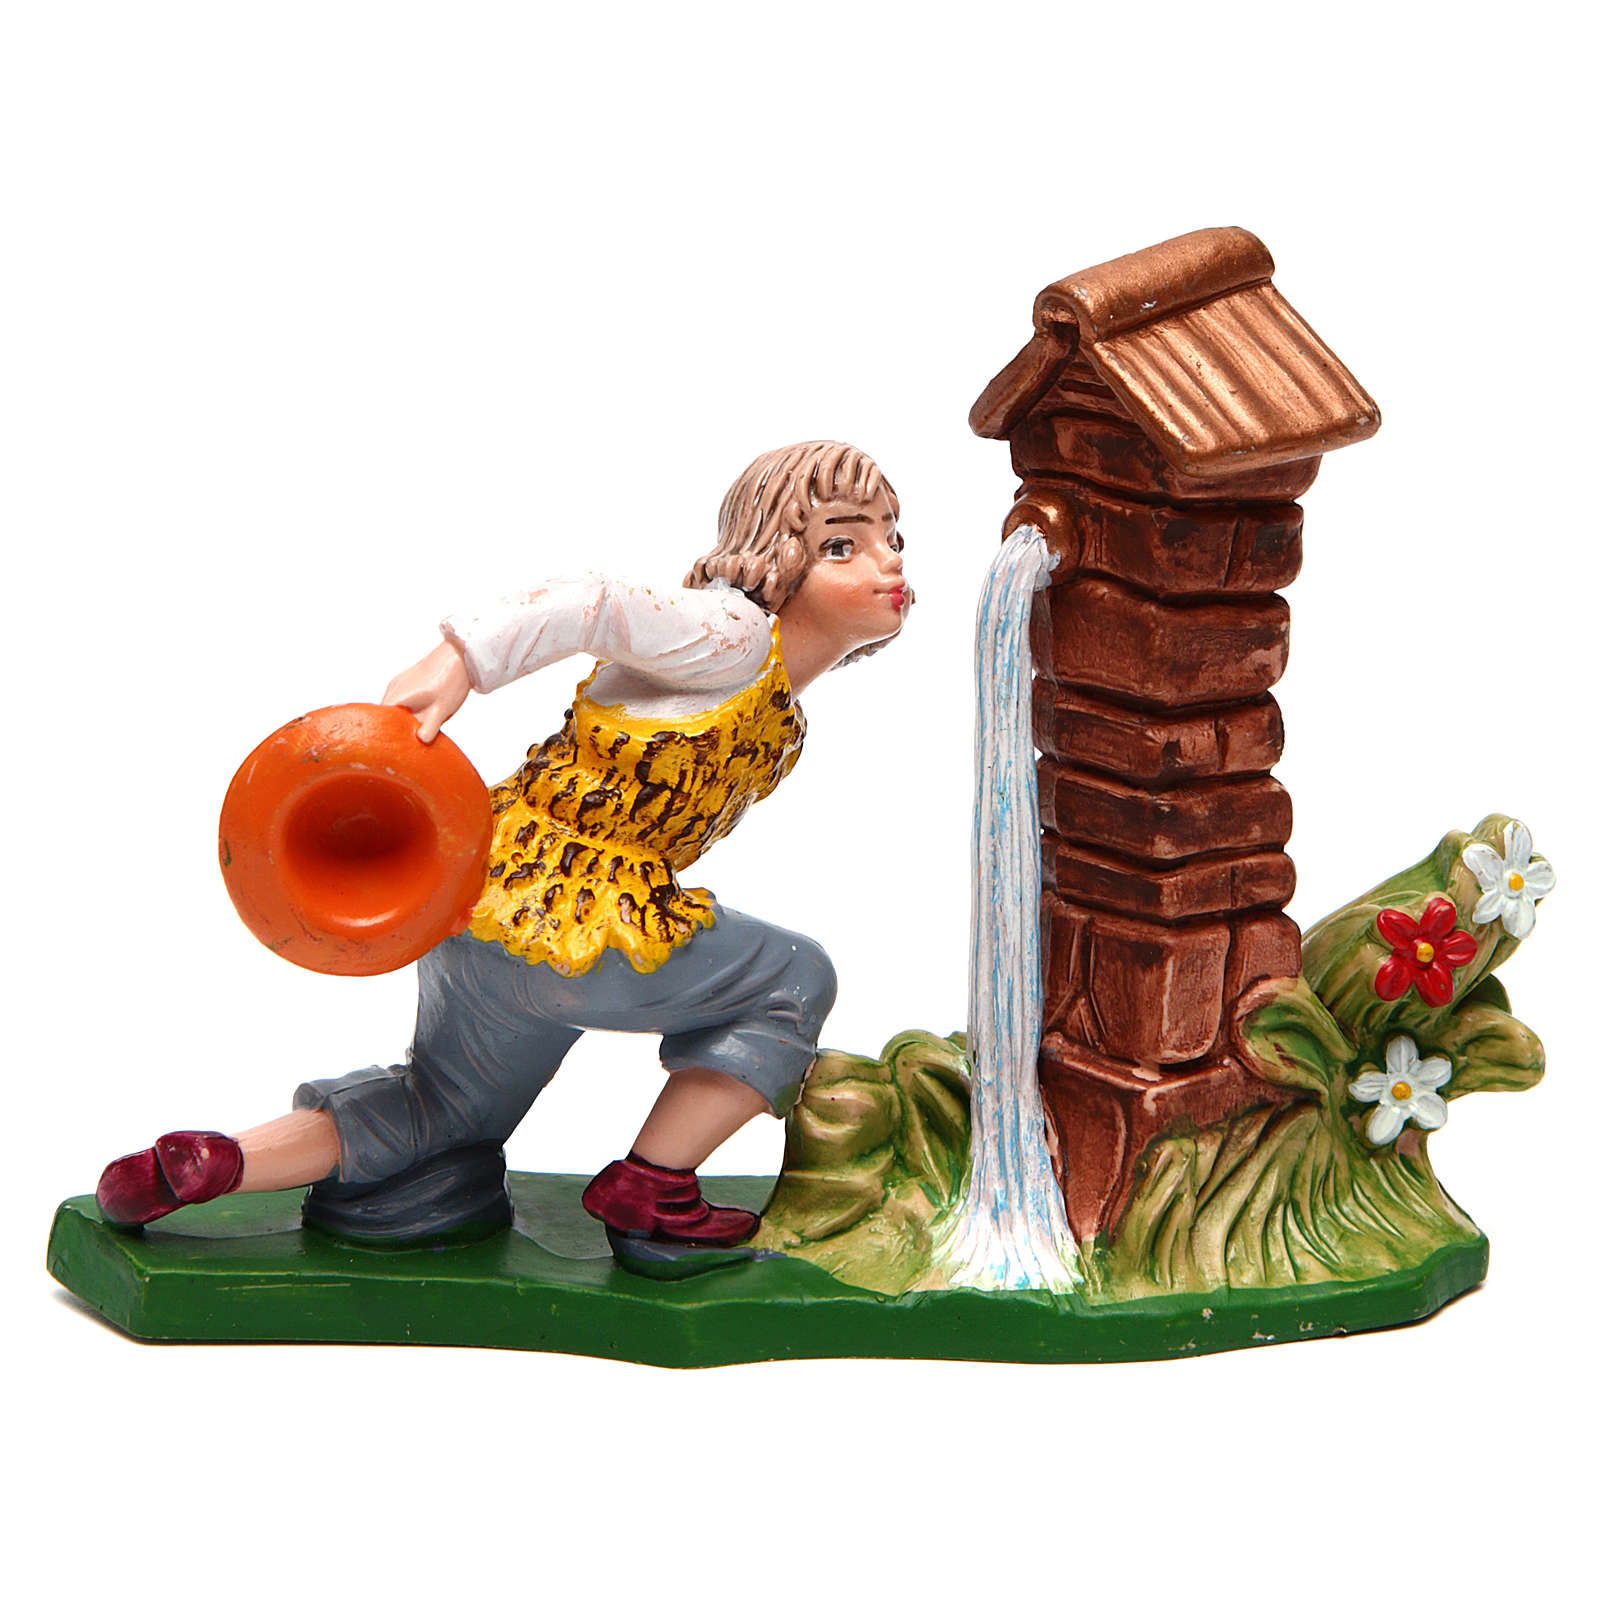 Uomo alla fontana 12 cm presepe 3